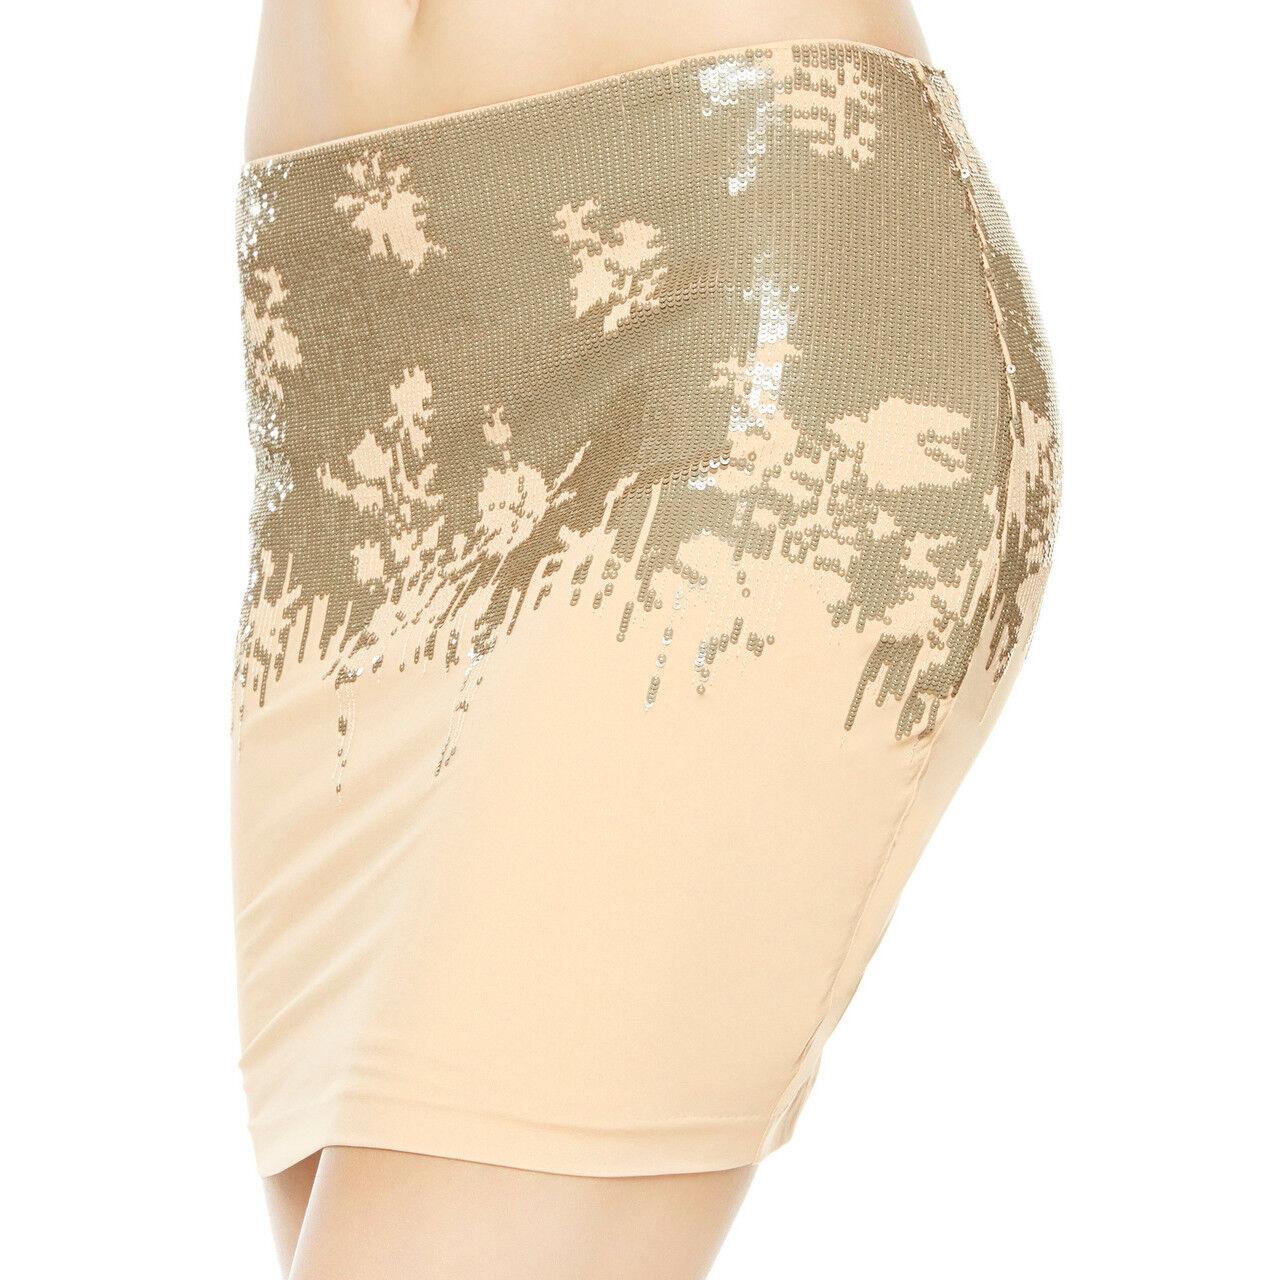 La Perla Ombre Floral Sequined Short Skirt Beige